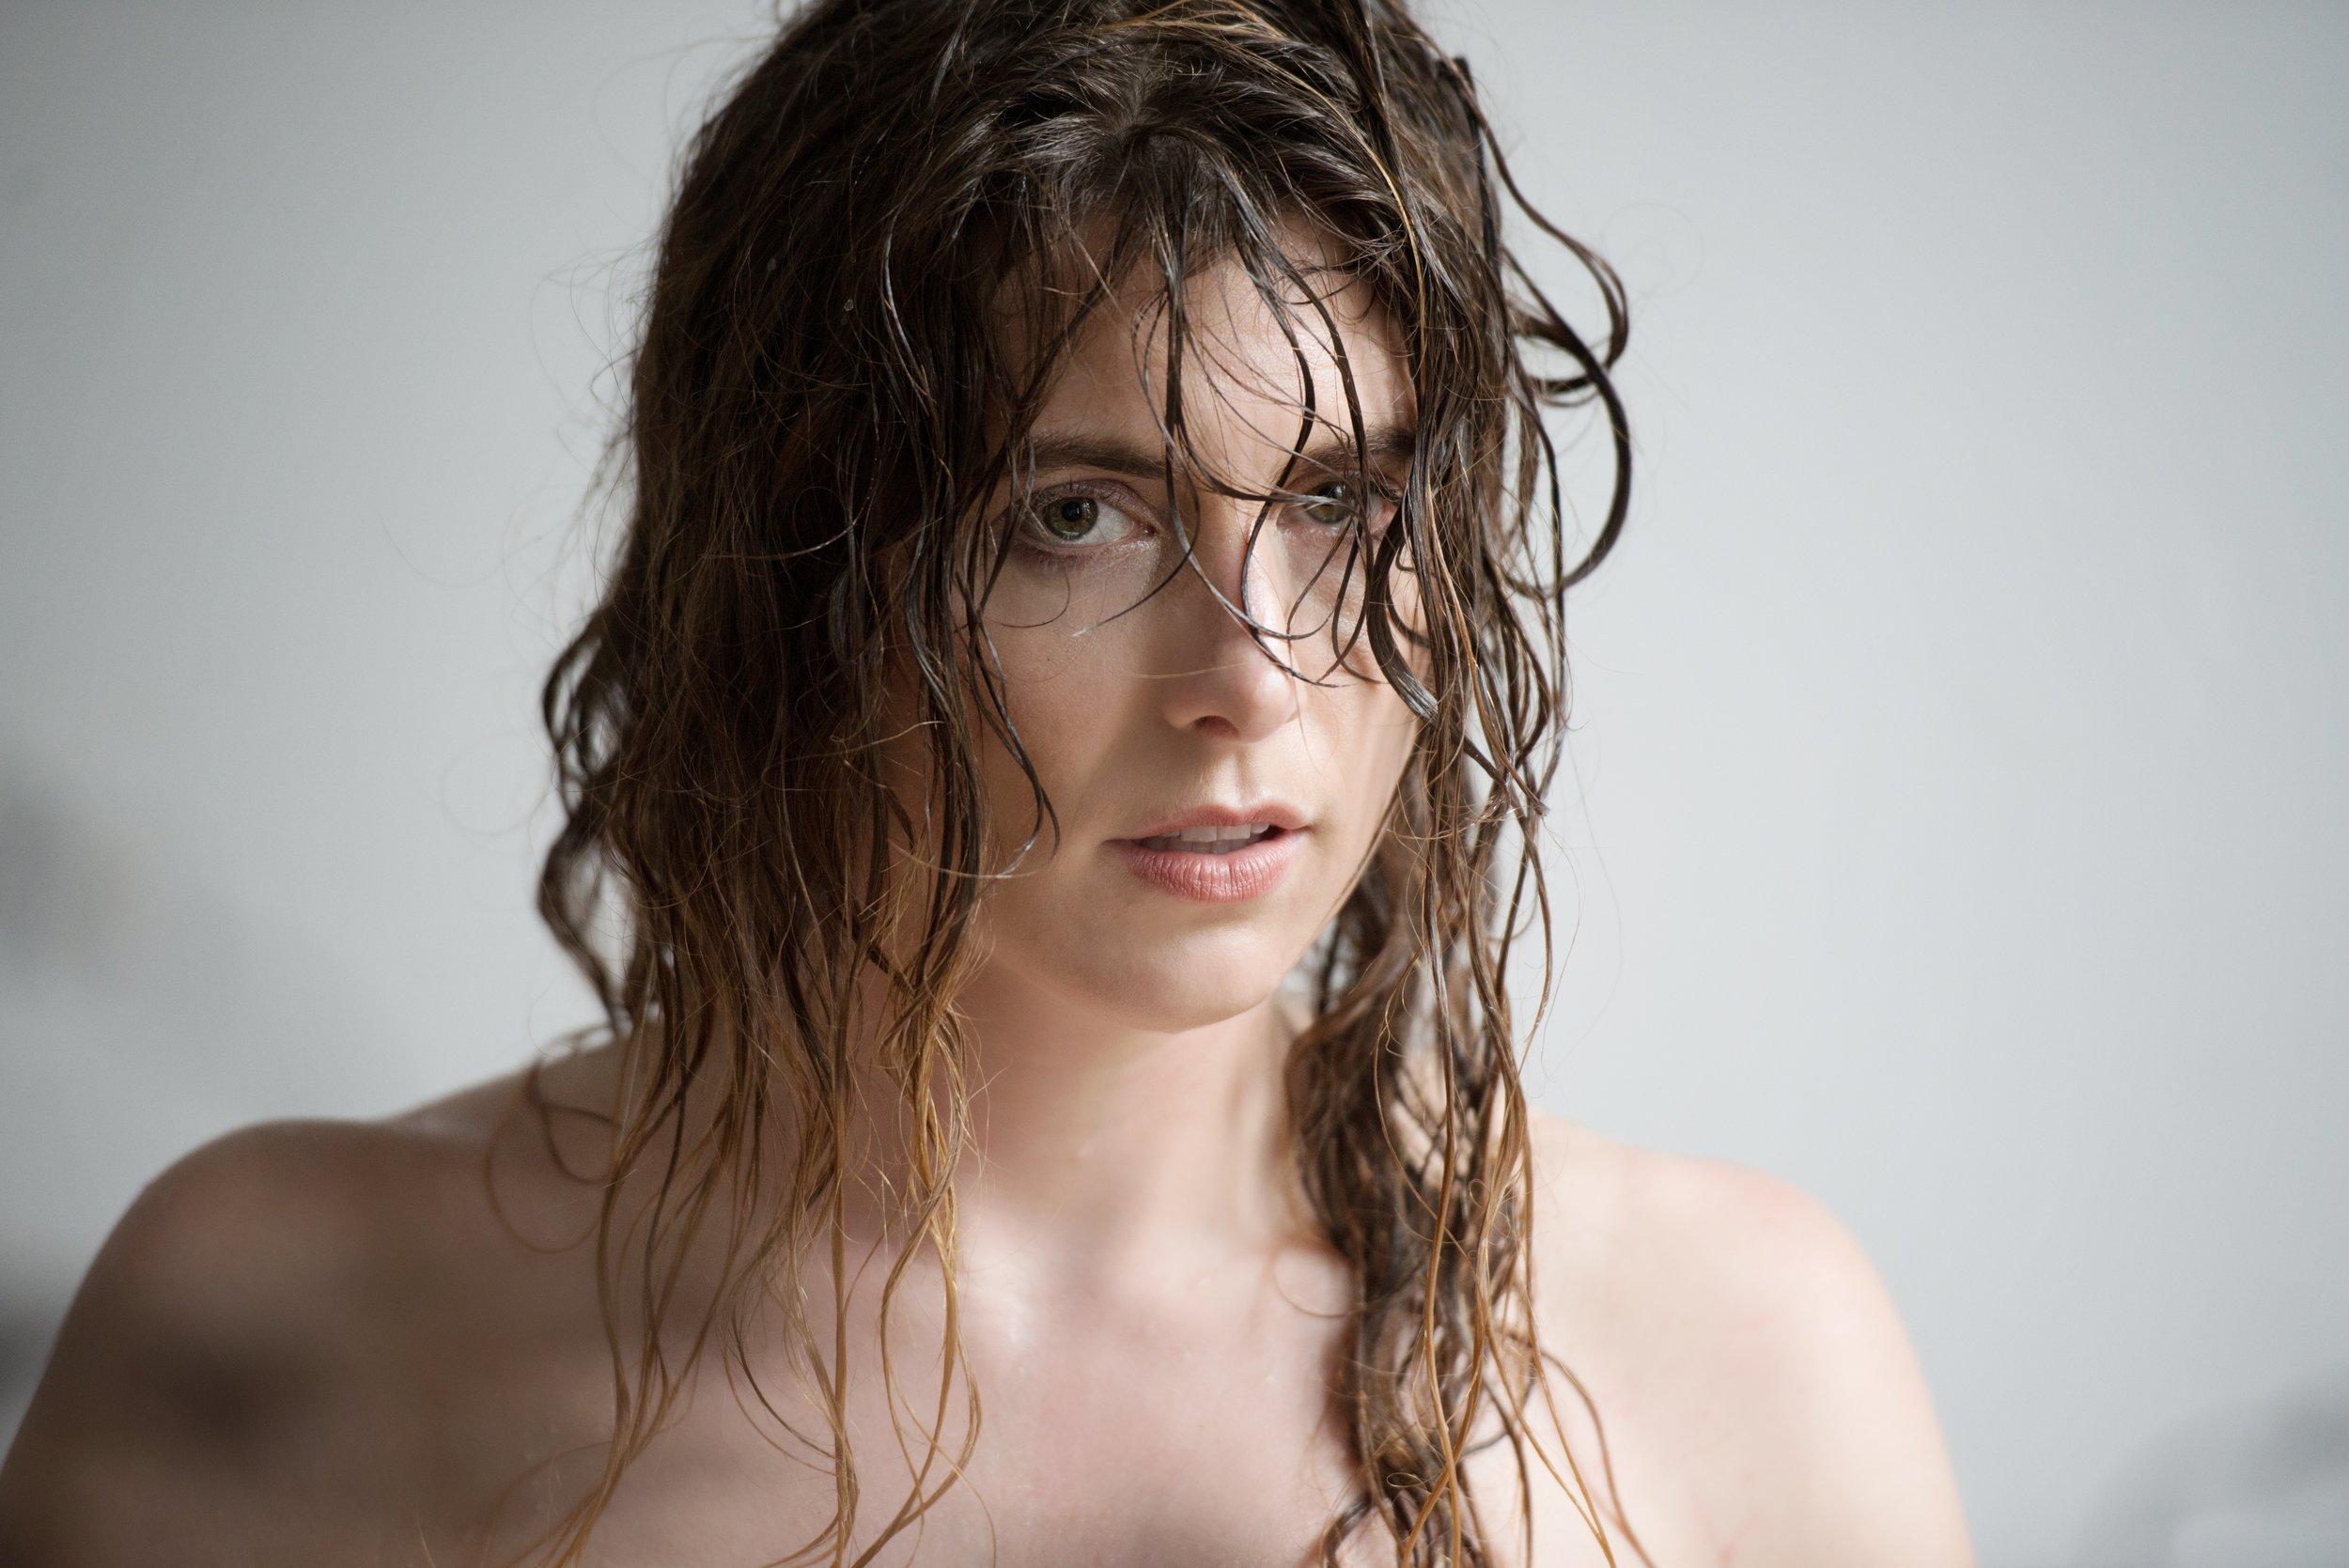 Wavy Alabaster x Merritt Lee Photography